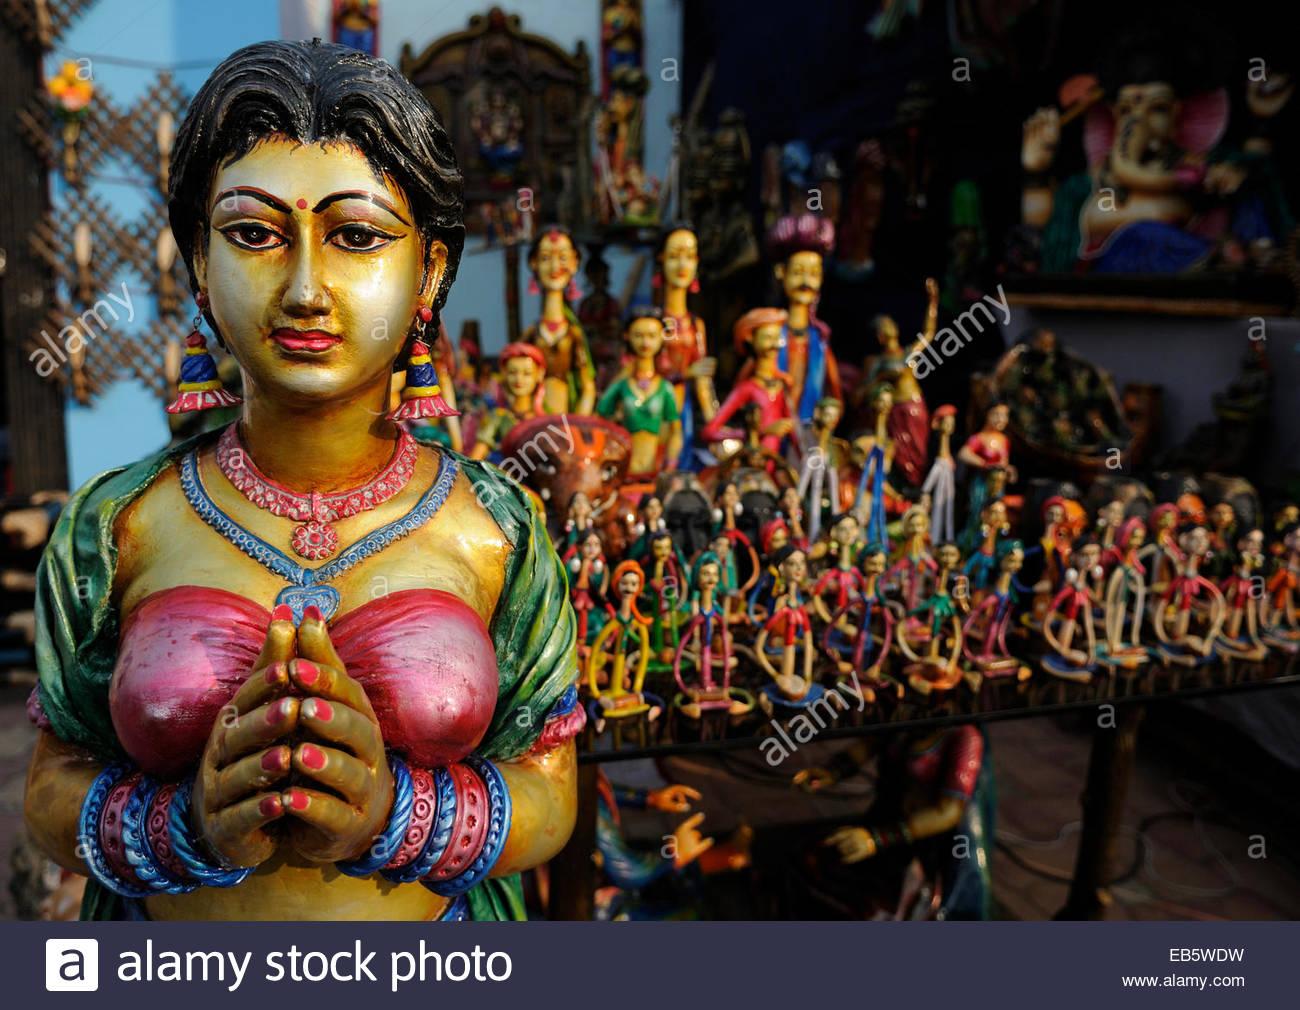 Tera Cotta Dolls During The Handicrafts Fair In Kolkata India